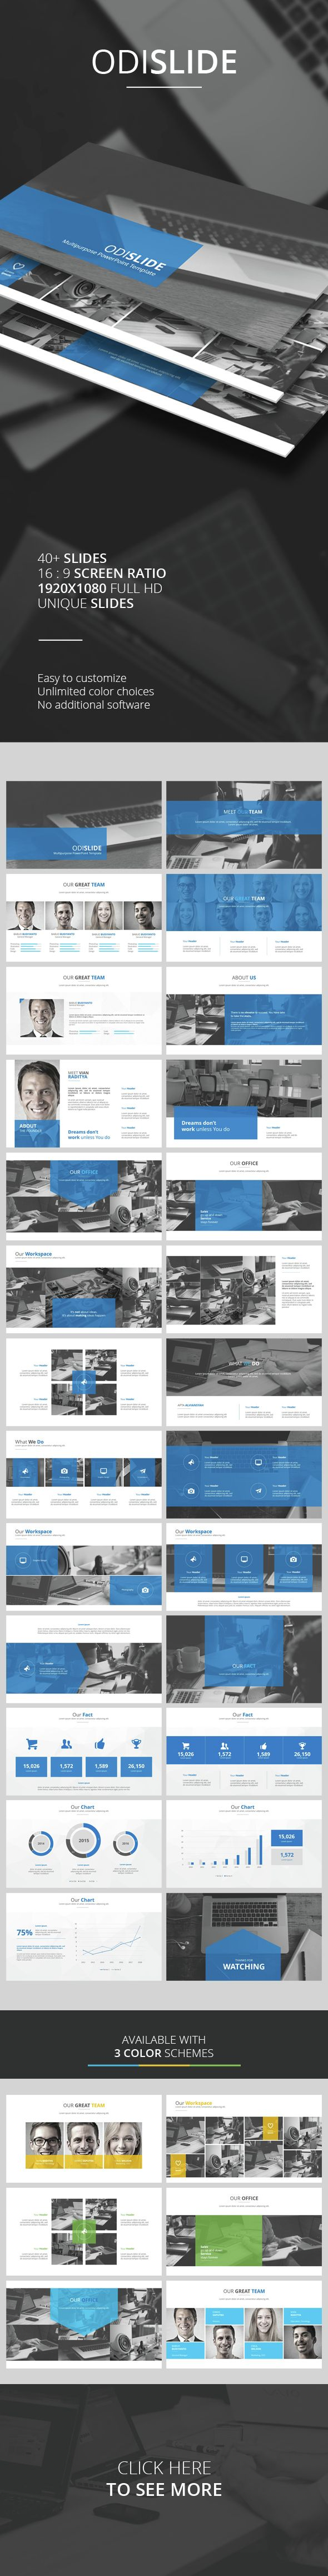 Odislide Keynote Template. Download here: http://graphicriver.net/item/odislide-keynote-template/14860418?ref=ksioks